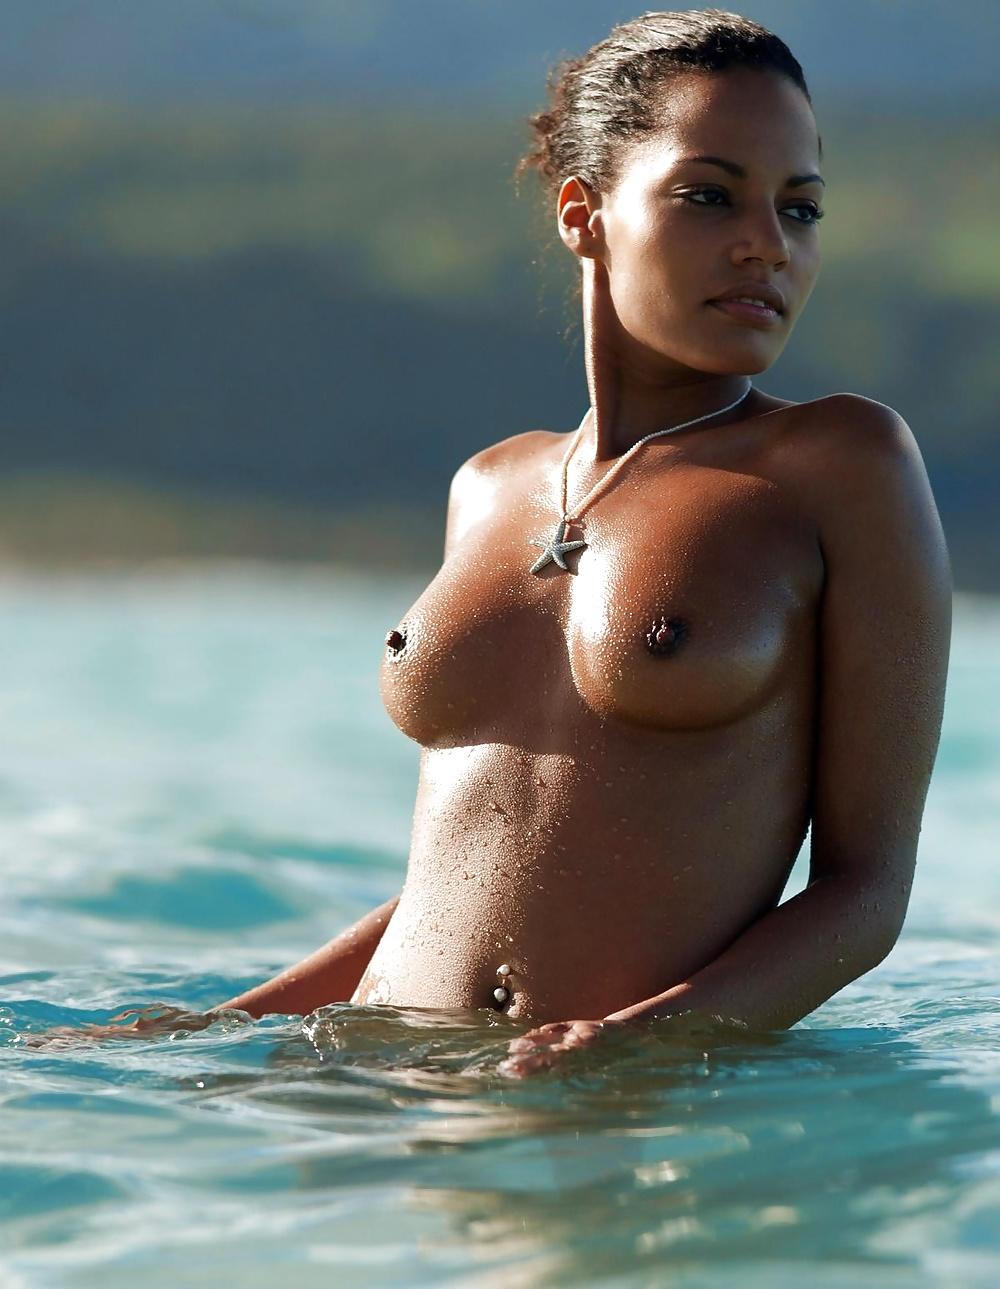 Get nicaraguan women porn for free